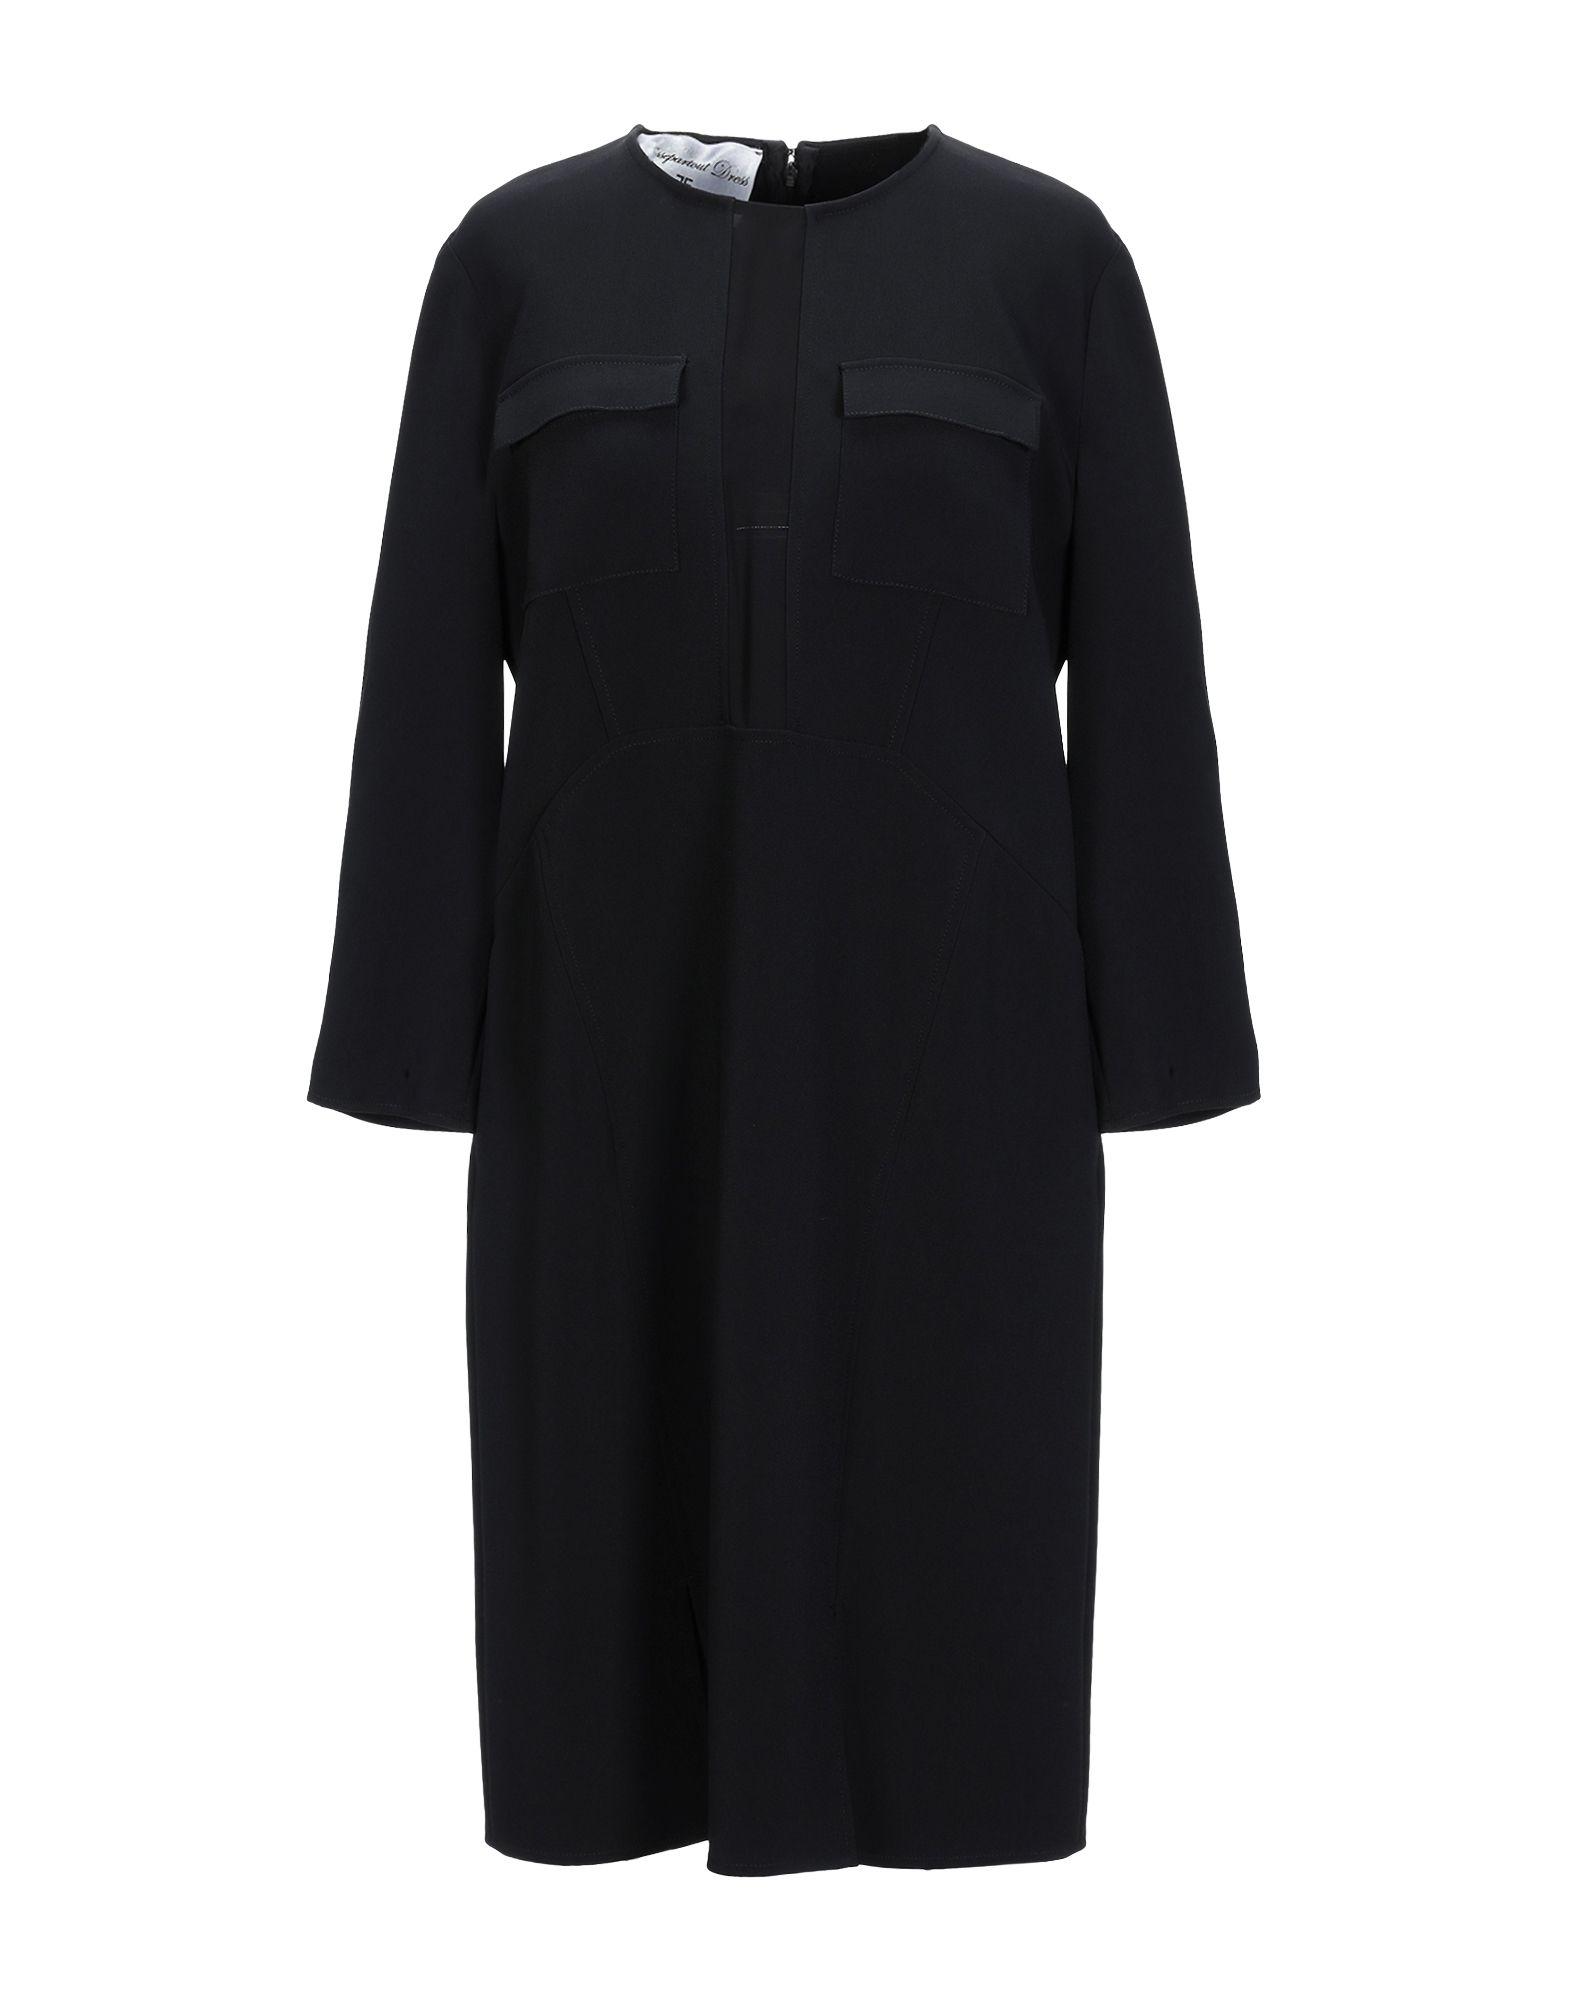 PASSEPARTOUT DRESS by ELISABETTA FRANCHI CELYN b. Короткое платье passepartout dress by elisabetta franchi celyn b платье длиной 3 4